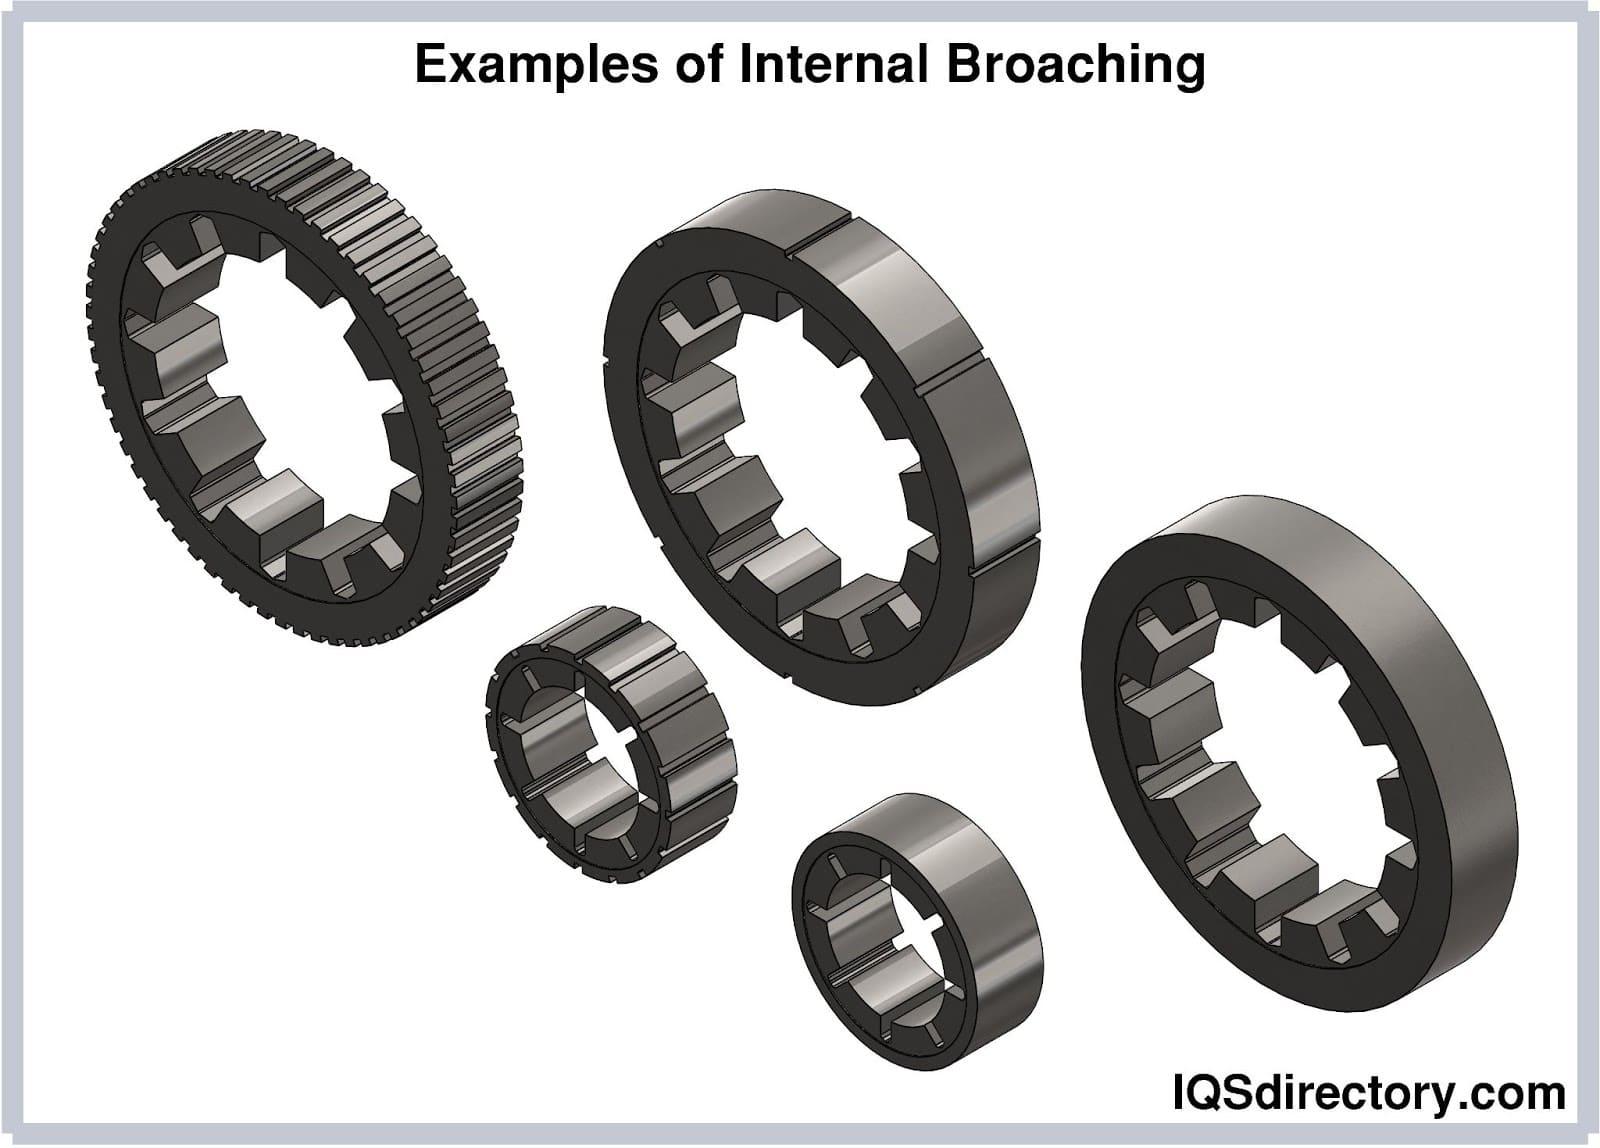 Examples of Internal Broaching